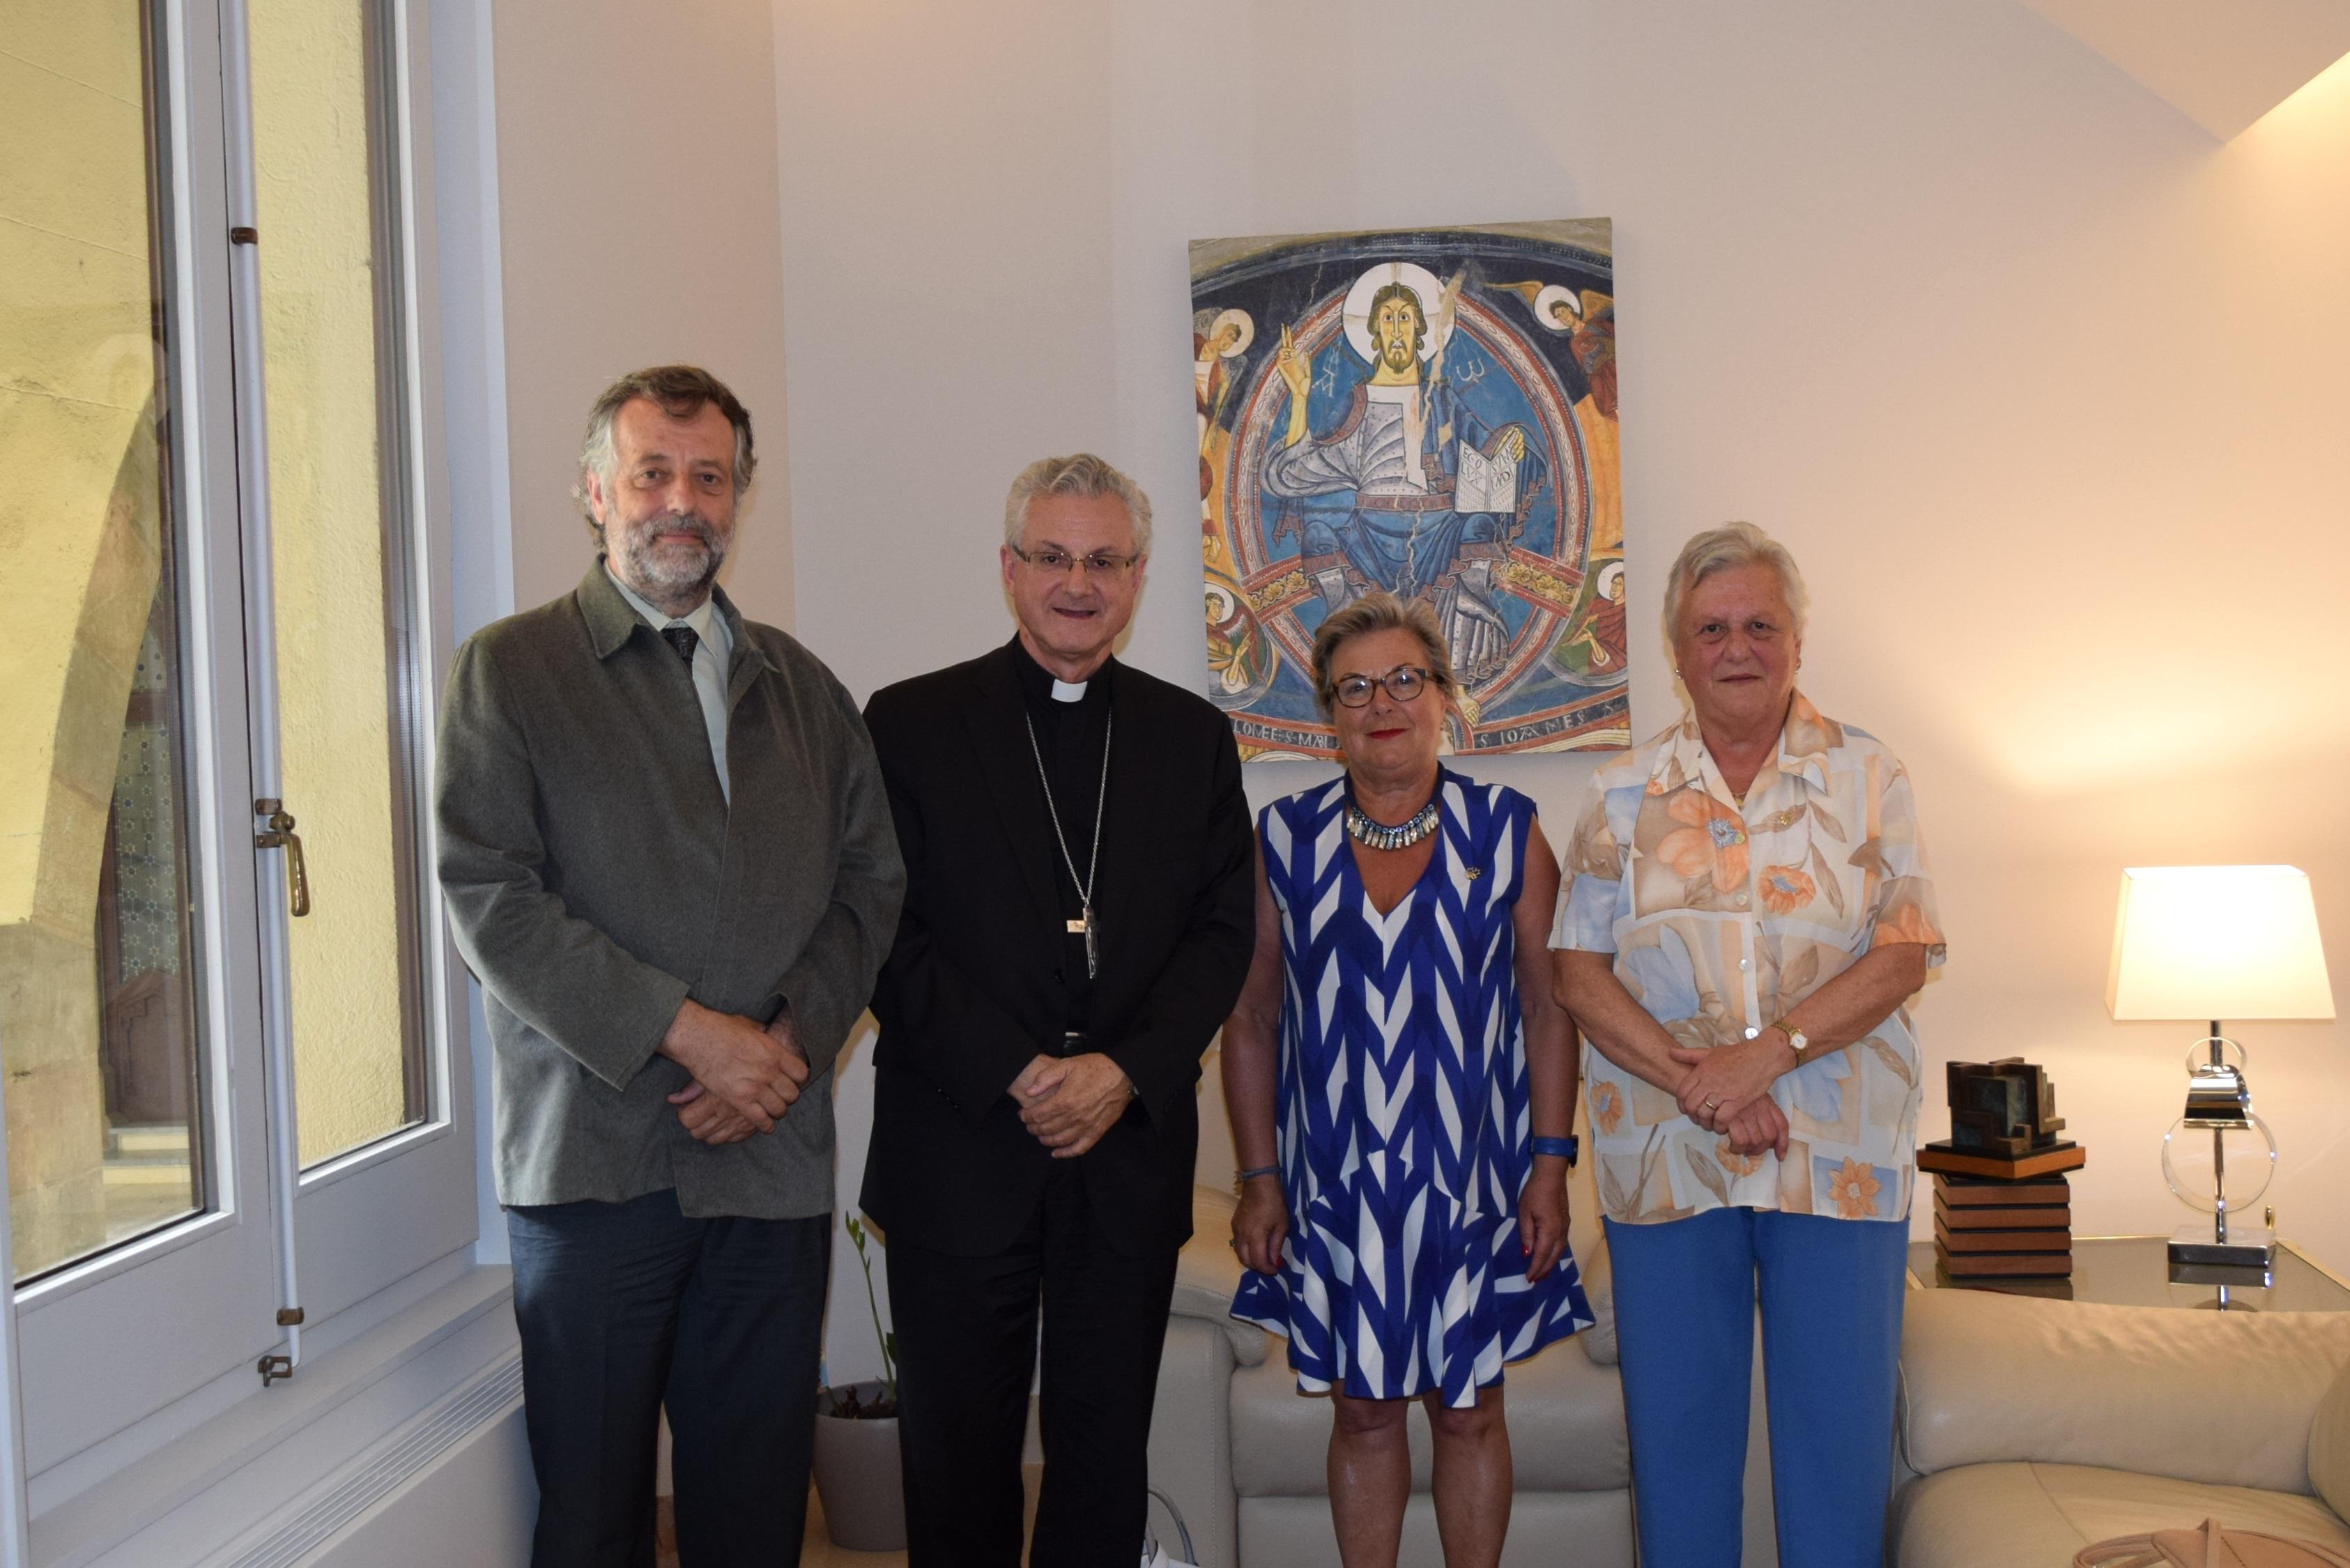 Presentacion Dera Acadèmia Ar Arquebisbe Joan Enric